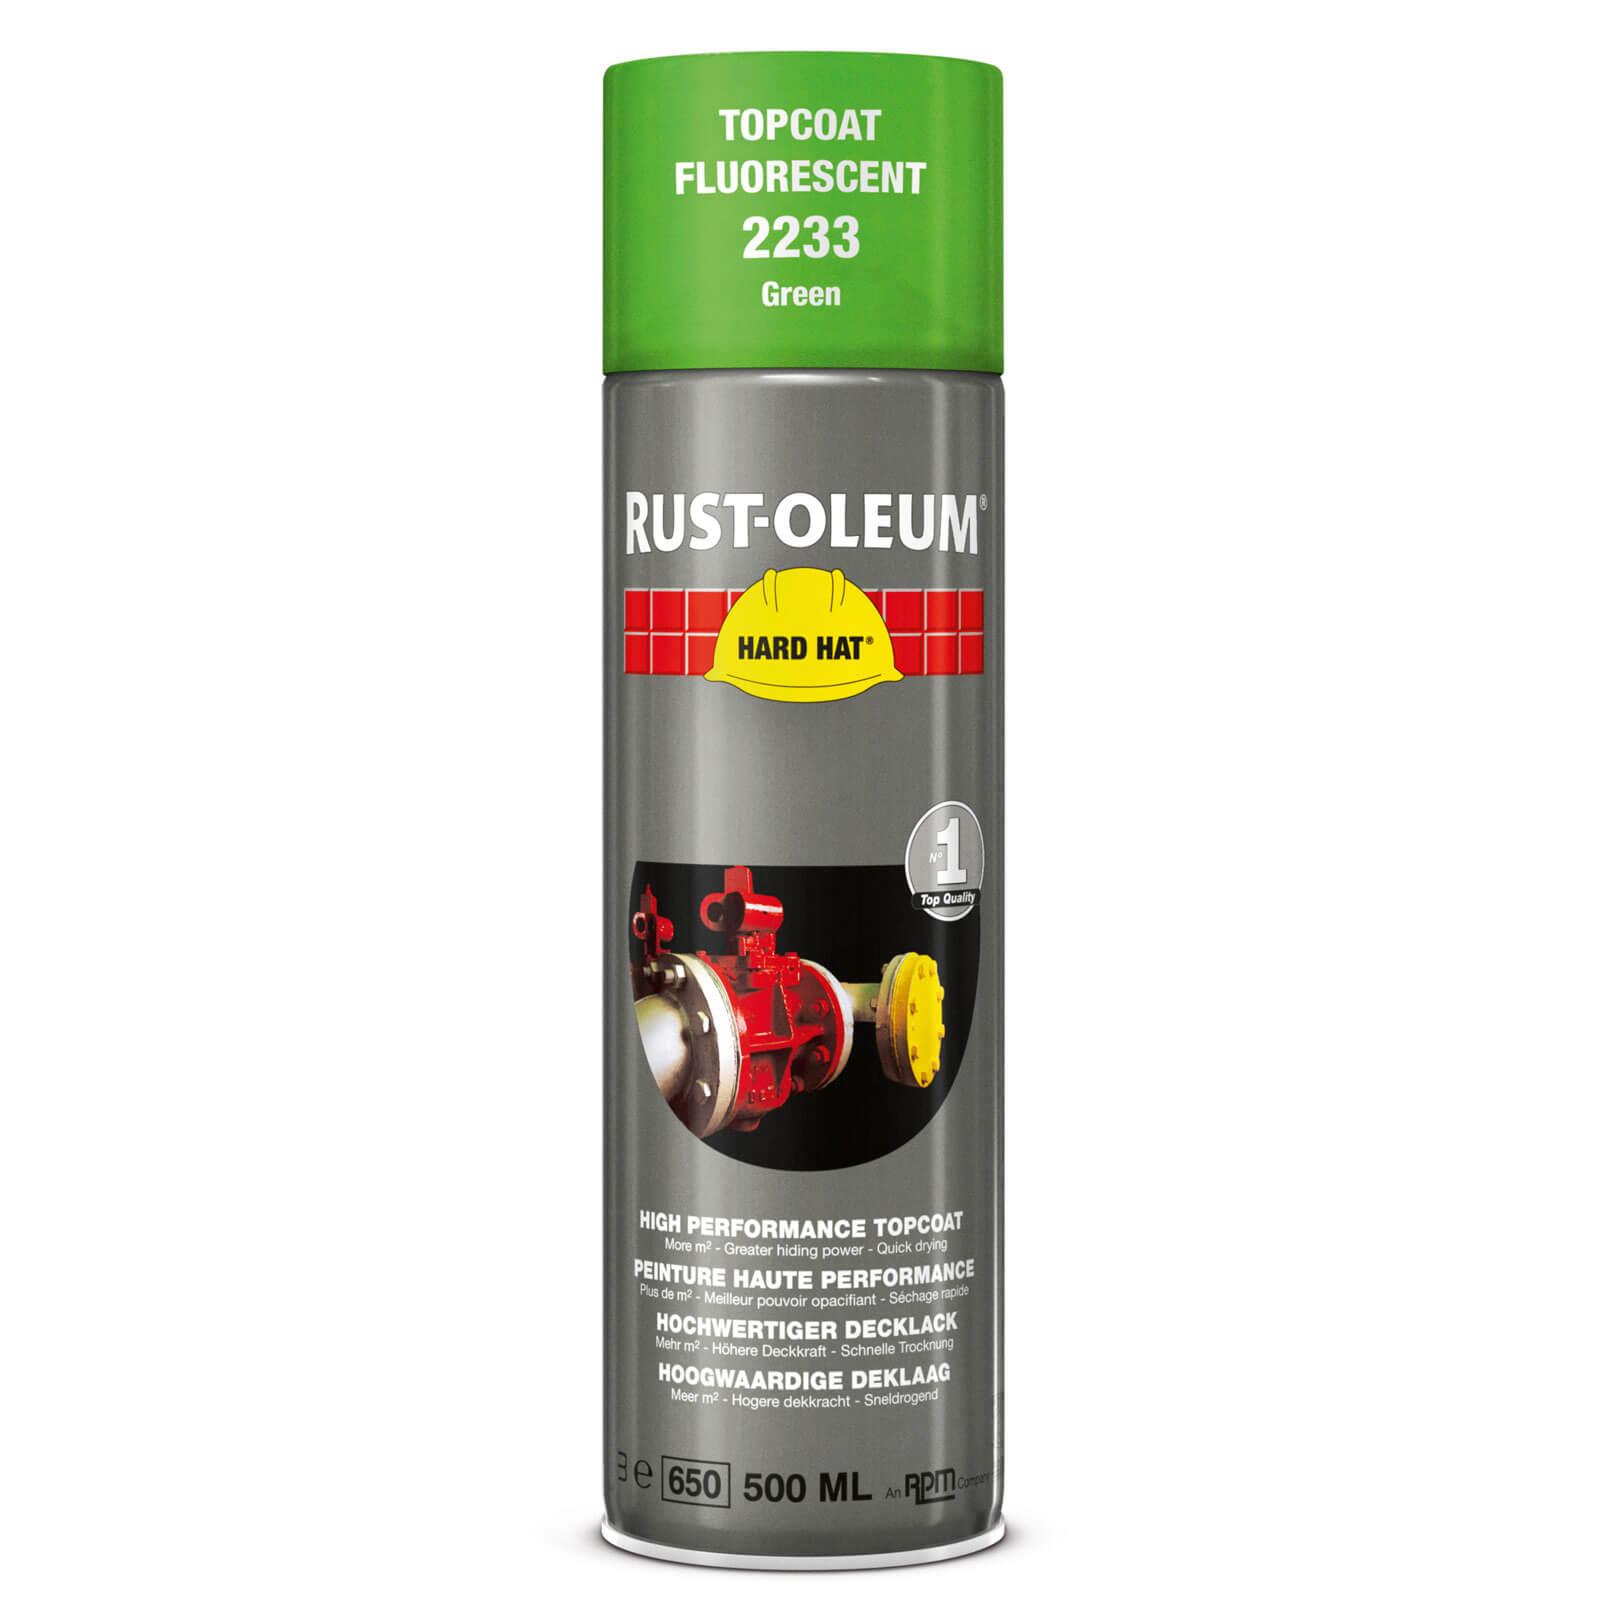 Image of Rust Oleum Hard Hat Fluorescent Spray Paint Green 500ml